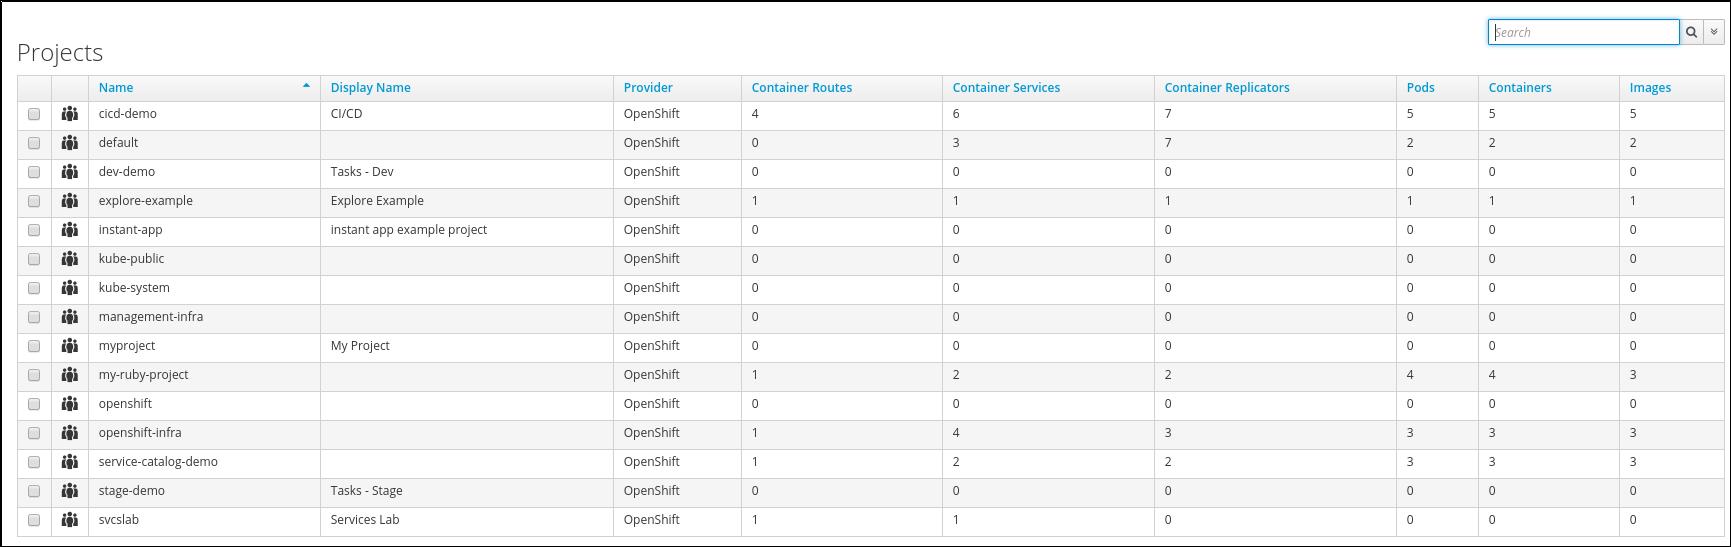 select service catalog demo project